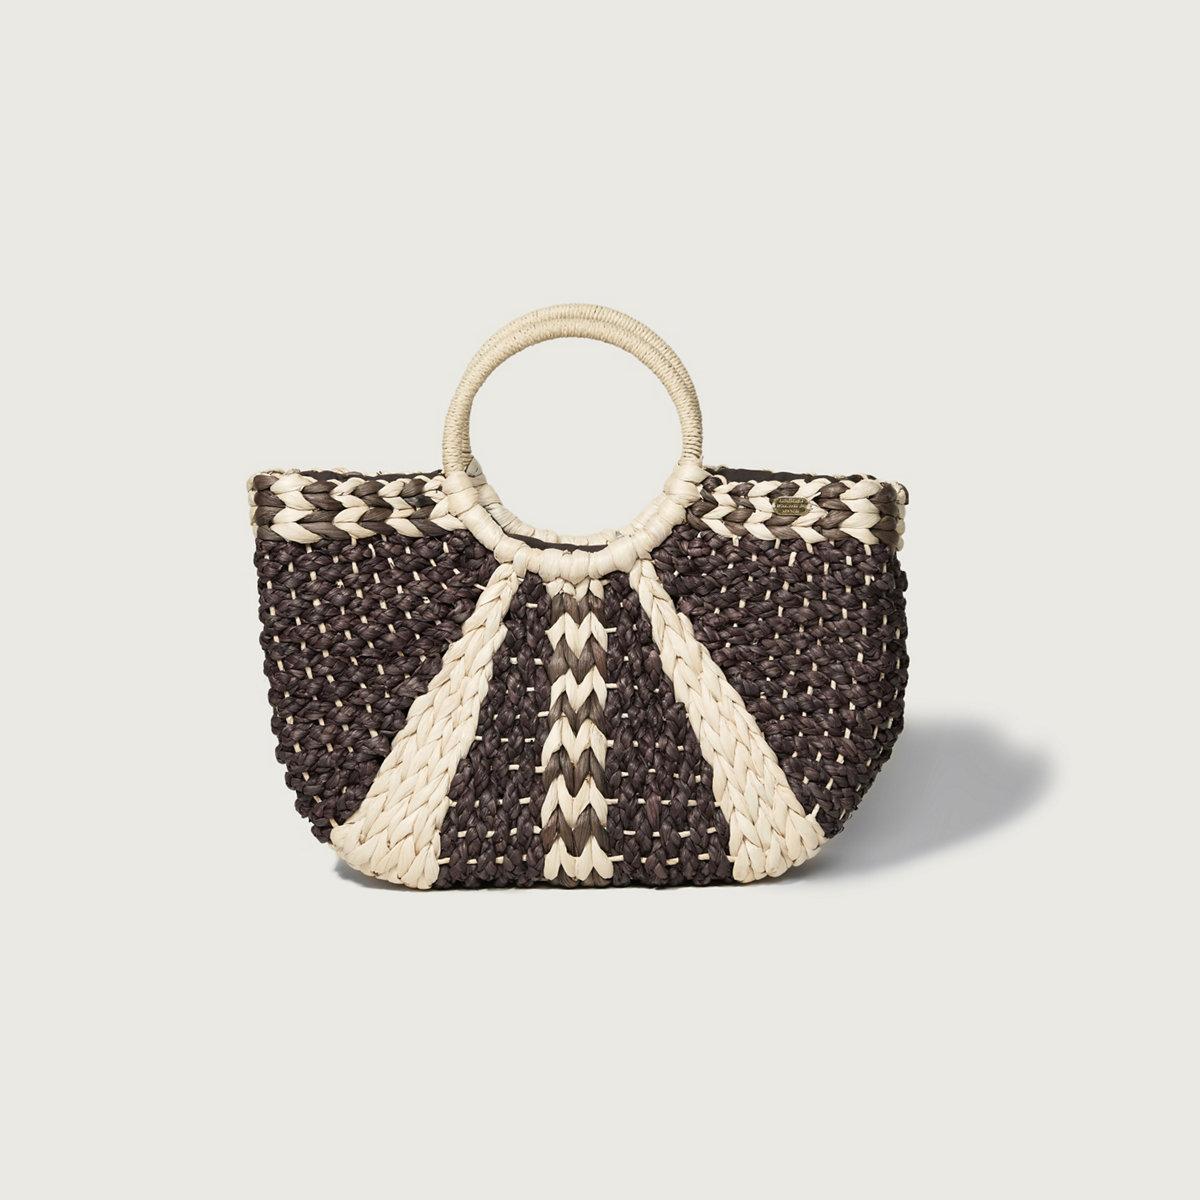 Woven Straw Basket Bag